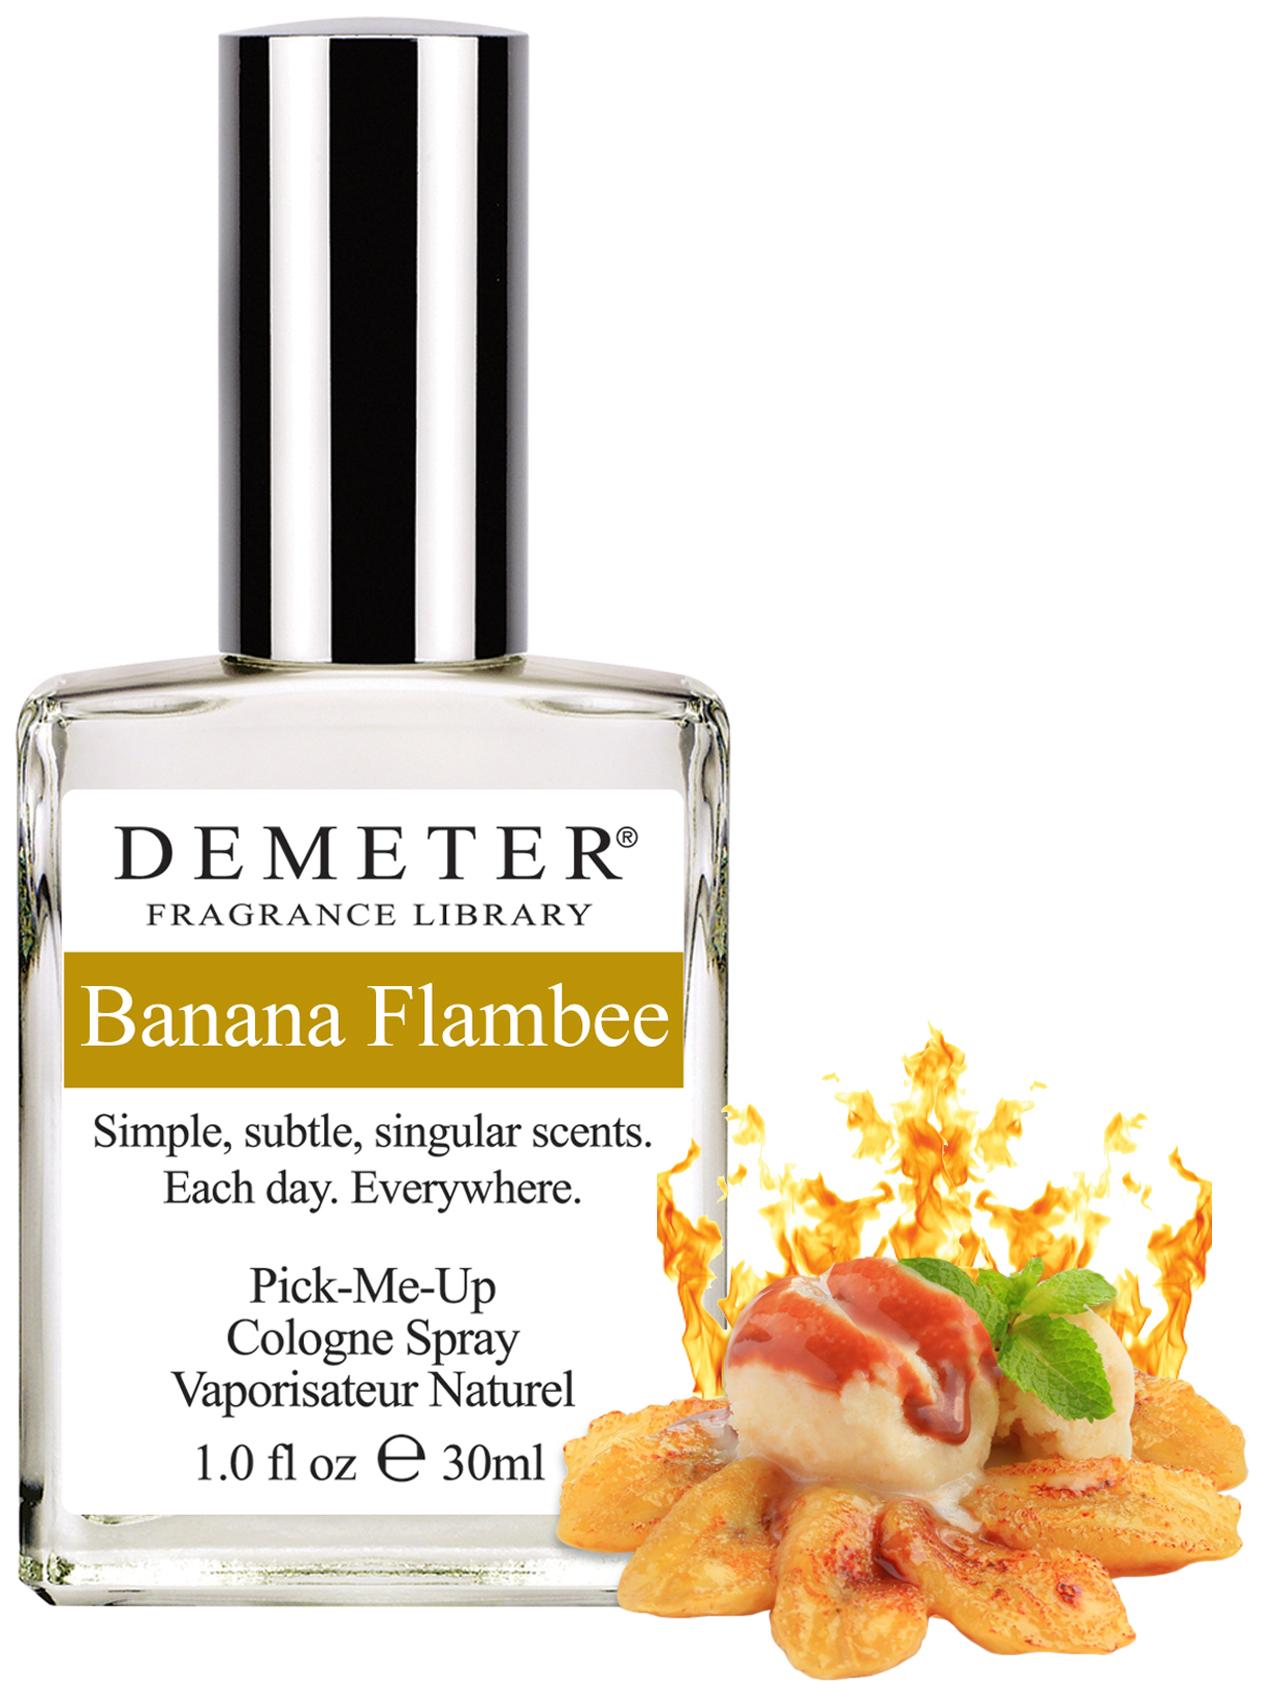 Купить Духи Demeter Fragrance Library Банановое фламбе (Banana Flambee) 30 мл, банановое фламбе (Banana Flambee)